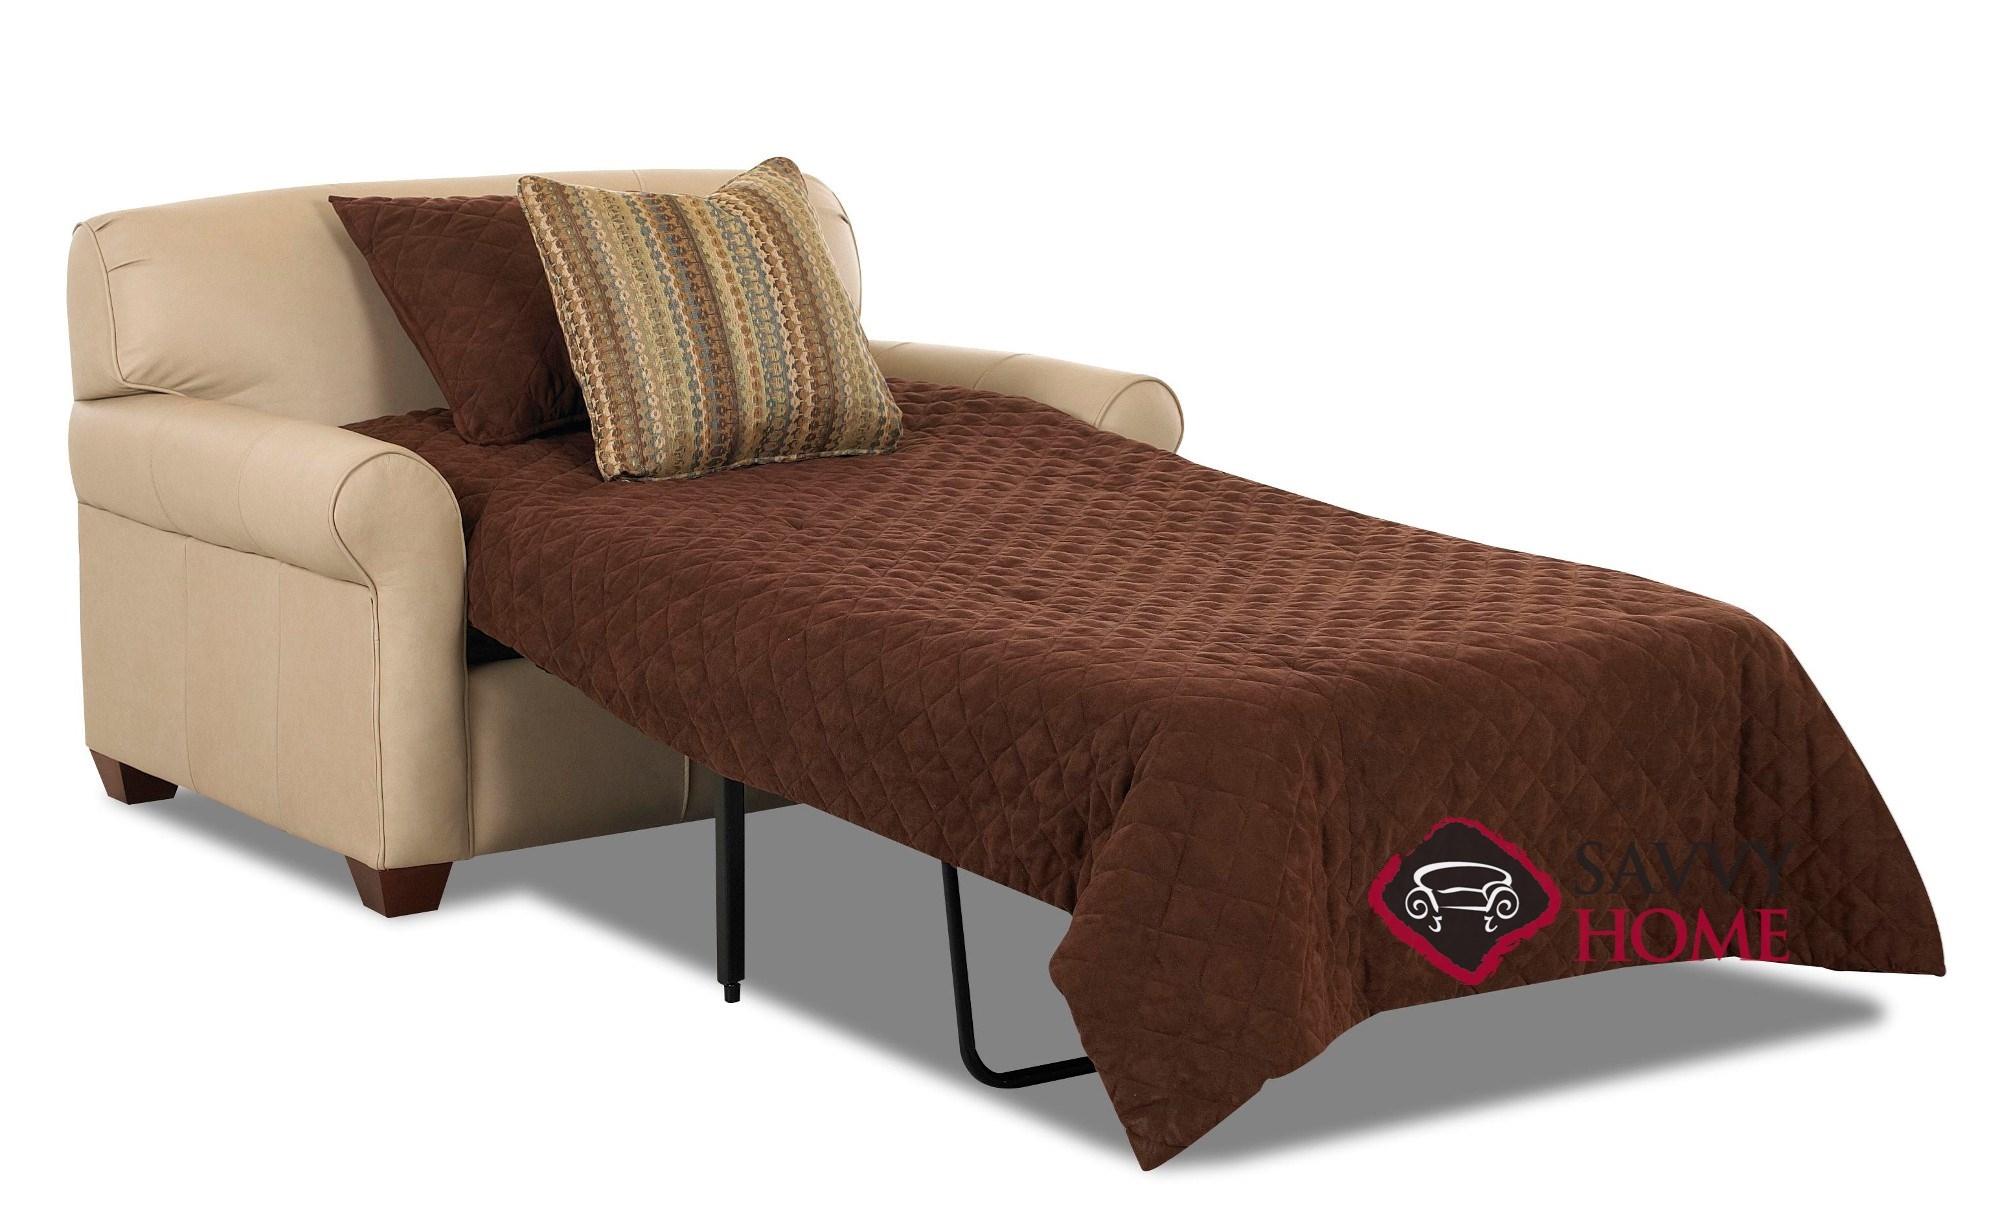 Calgary Fabric Sleeper Sofas Chair By Savvy Is Fully